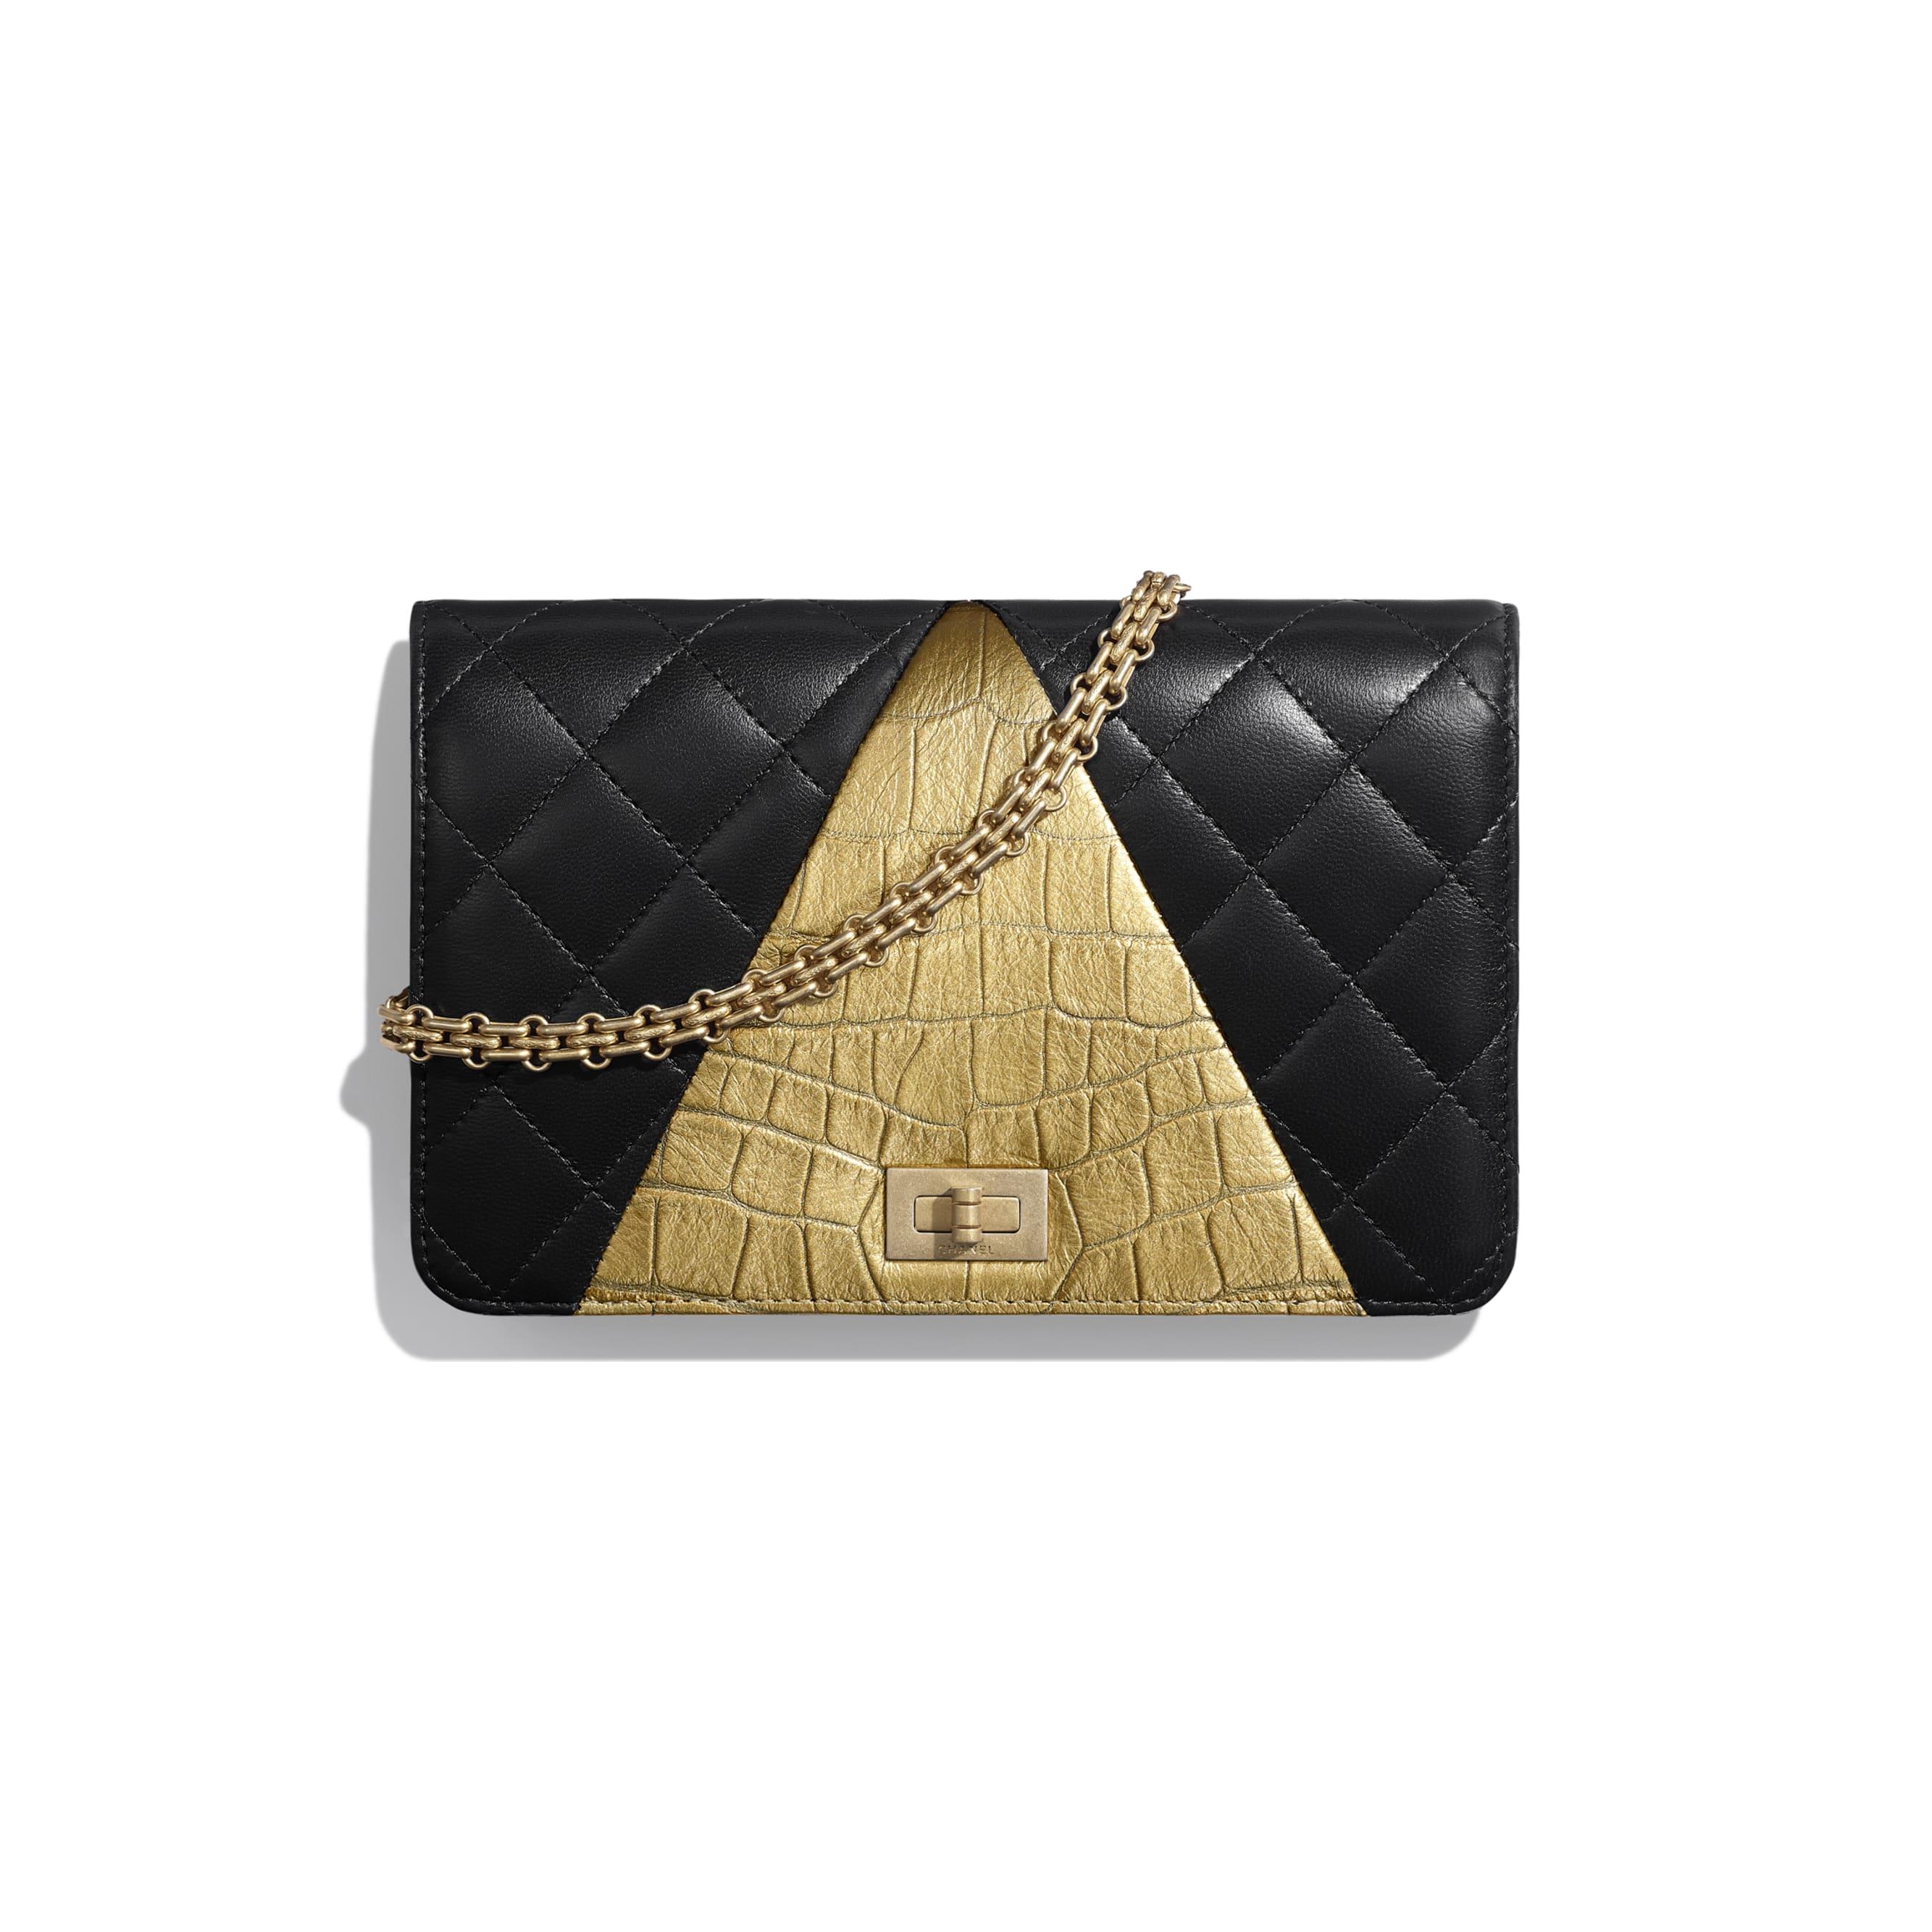 Wallet on Chain - Black & Gold - Lambskin, Crocodile Embossed Calfskin & Gold-Tone Metal - Default view - see standard sized version